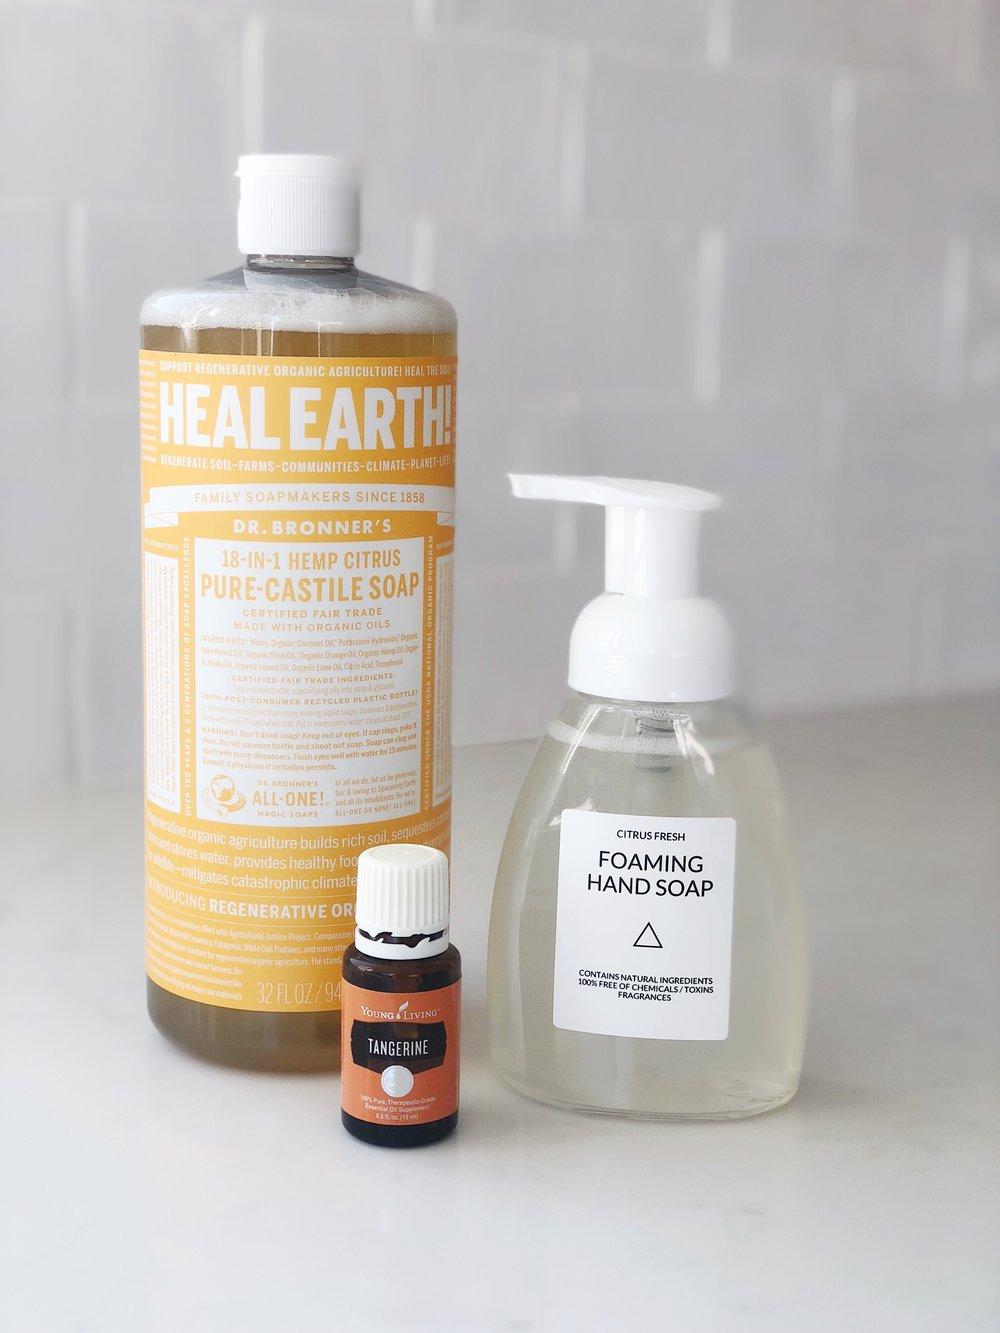 Homemade Foaming Hand Soap